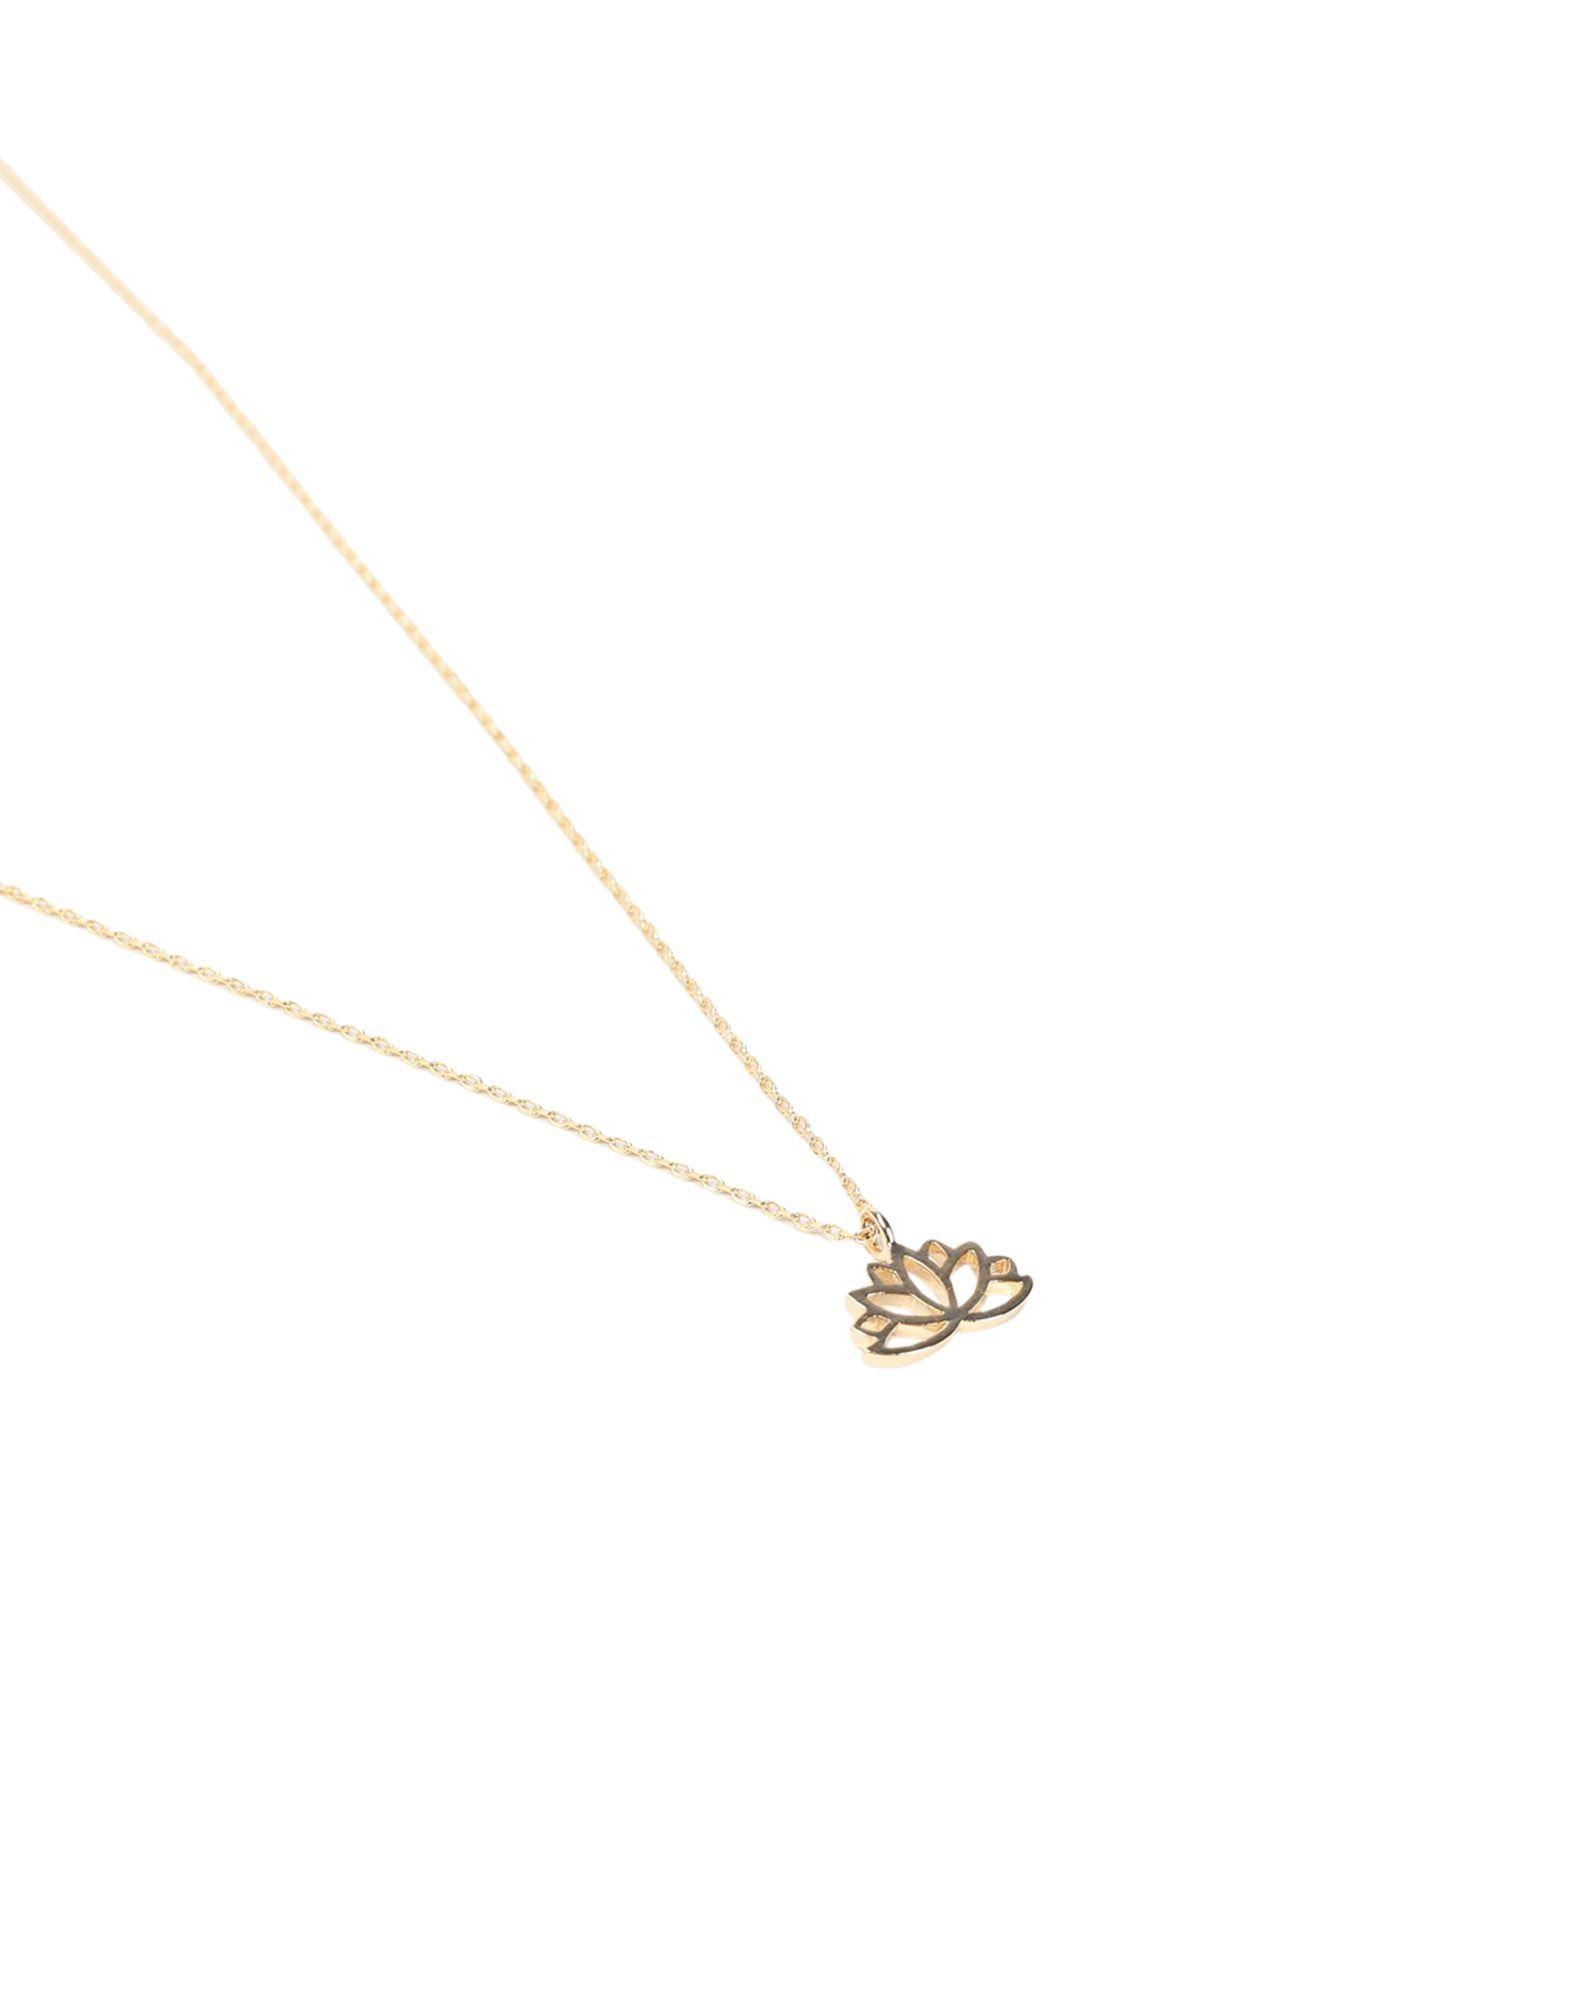 Estella Bartlett Gold Plated Lotus Necklace